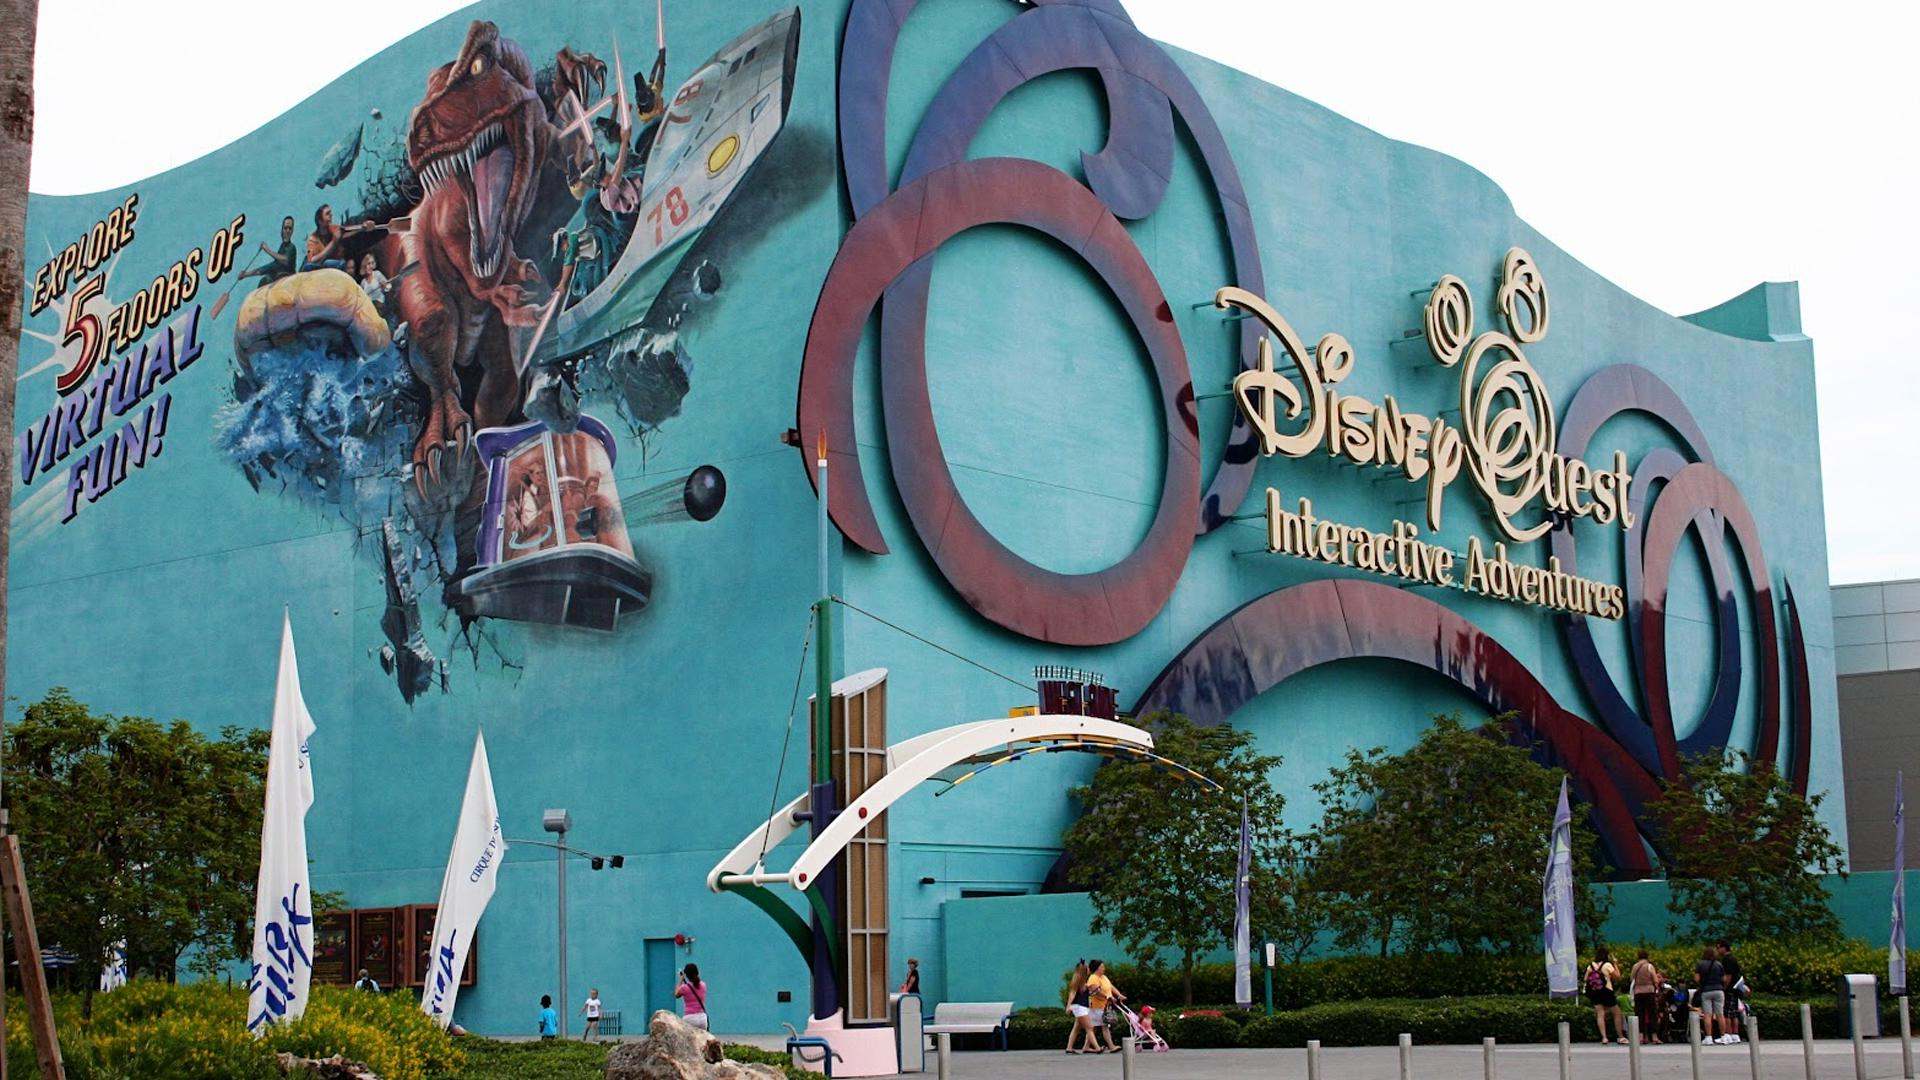 DisneyQuest Building.jpg